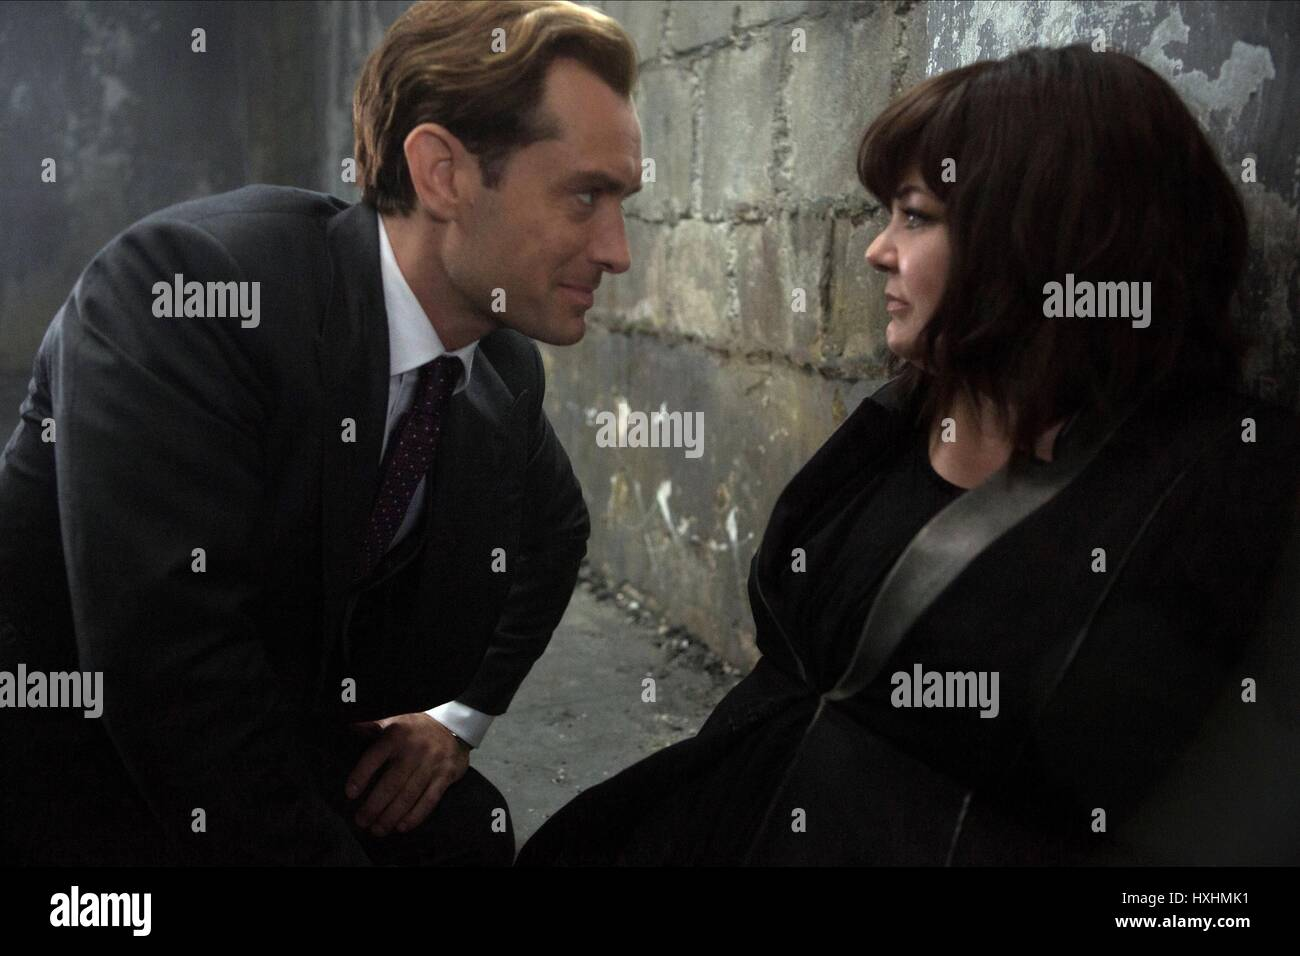 Jude Law Melissa Mccarthy Spy 2015 Stock Photo Alamy